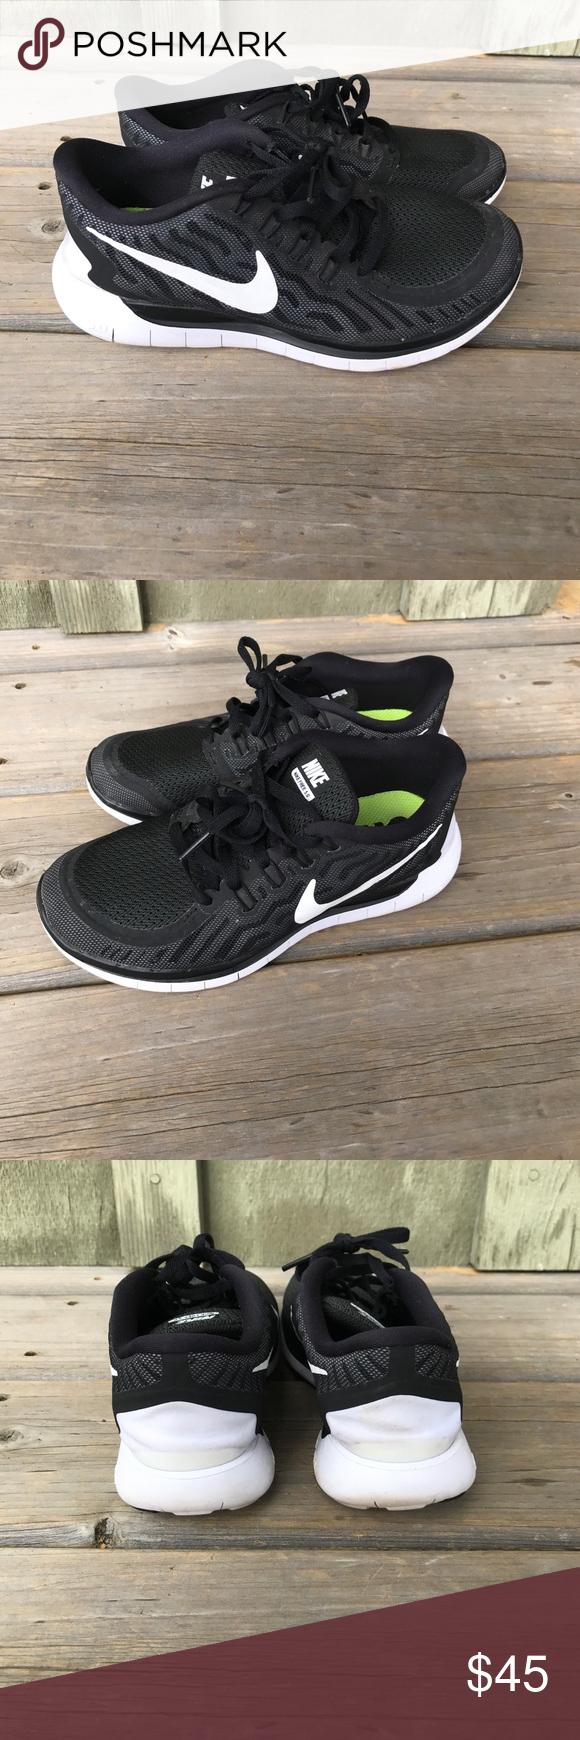 ángel herir Tierra  Women's Nike Free 5.0 RUNNING Barefoot Ride size 5 | Nike women, Womens  running shoes, Women shoes